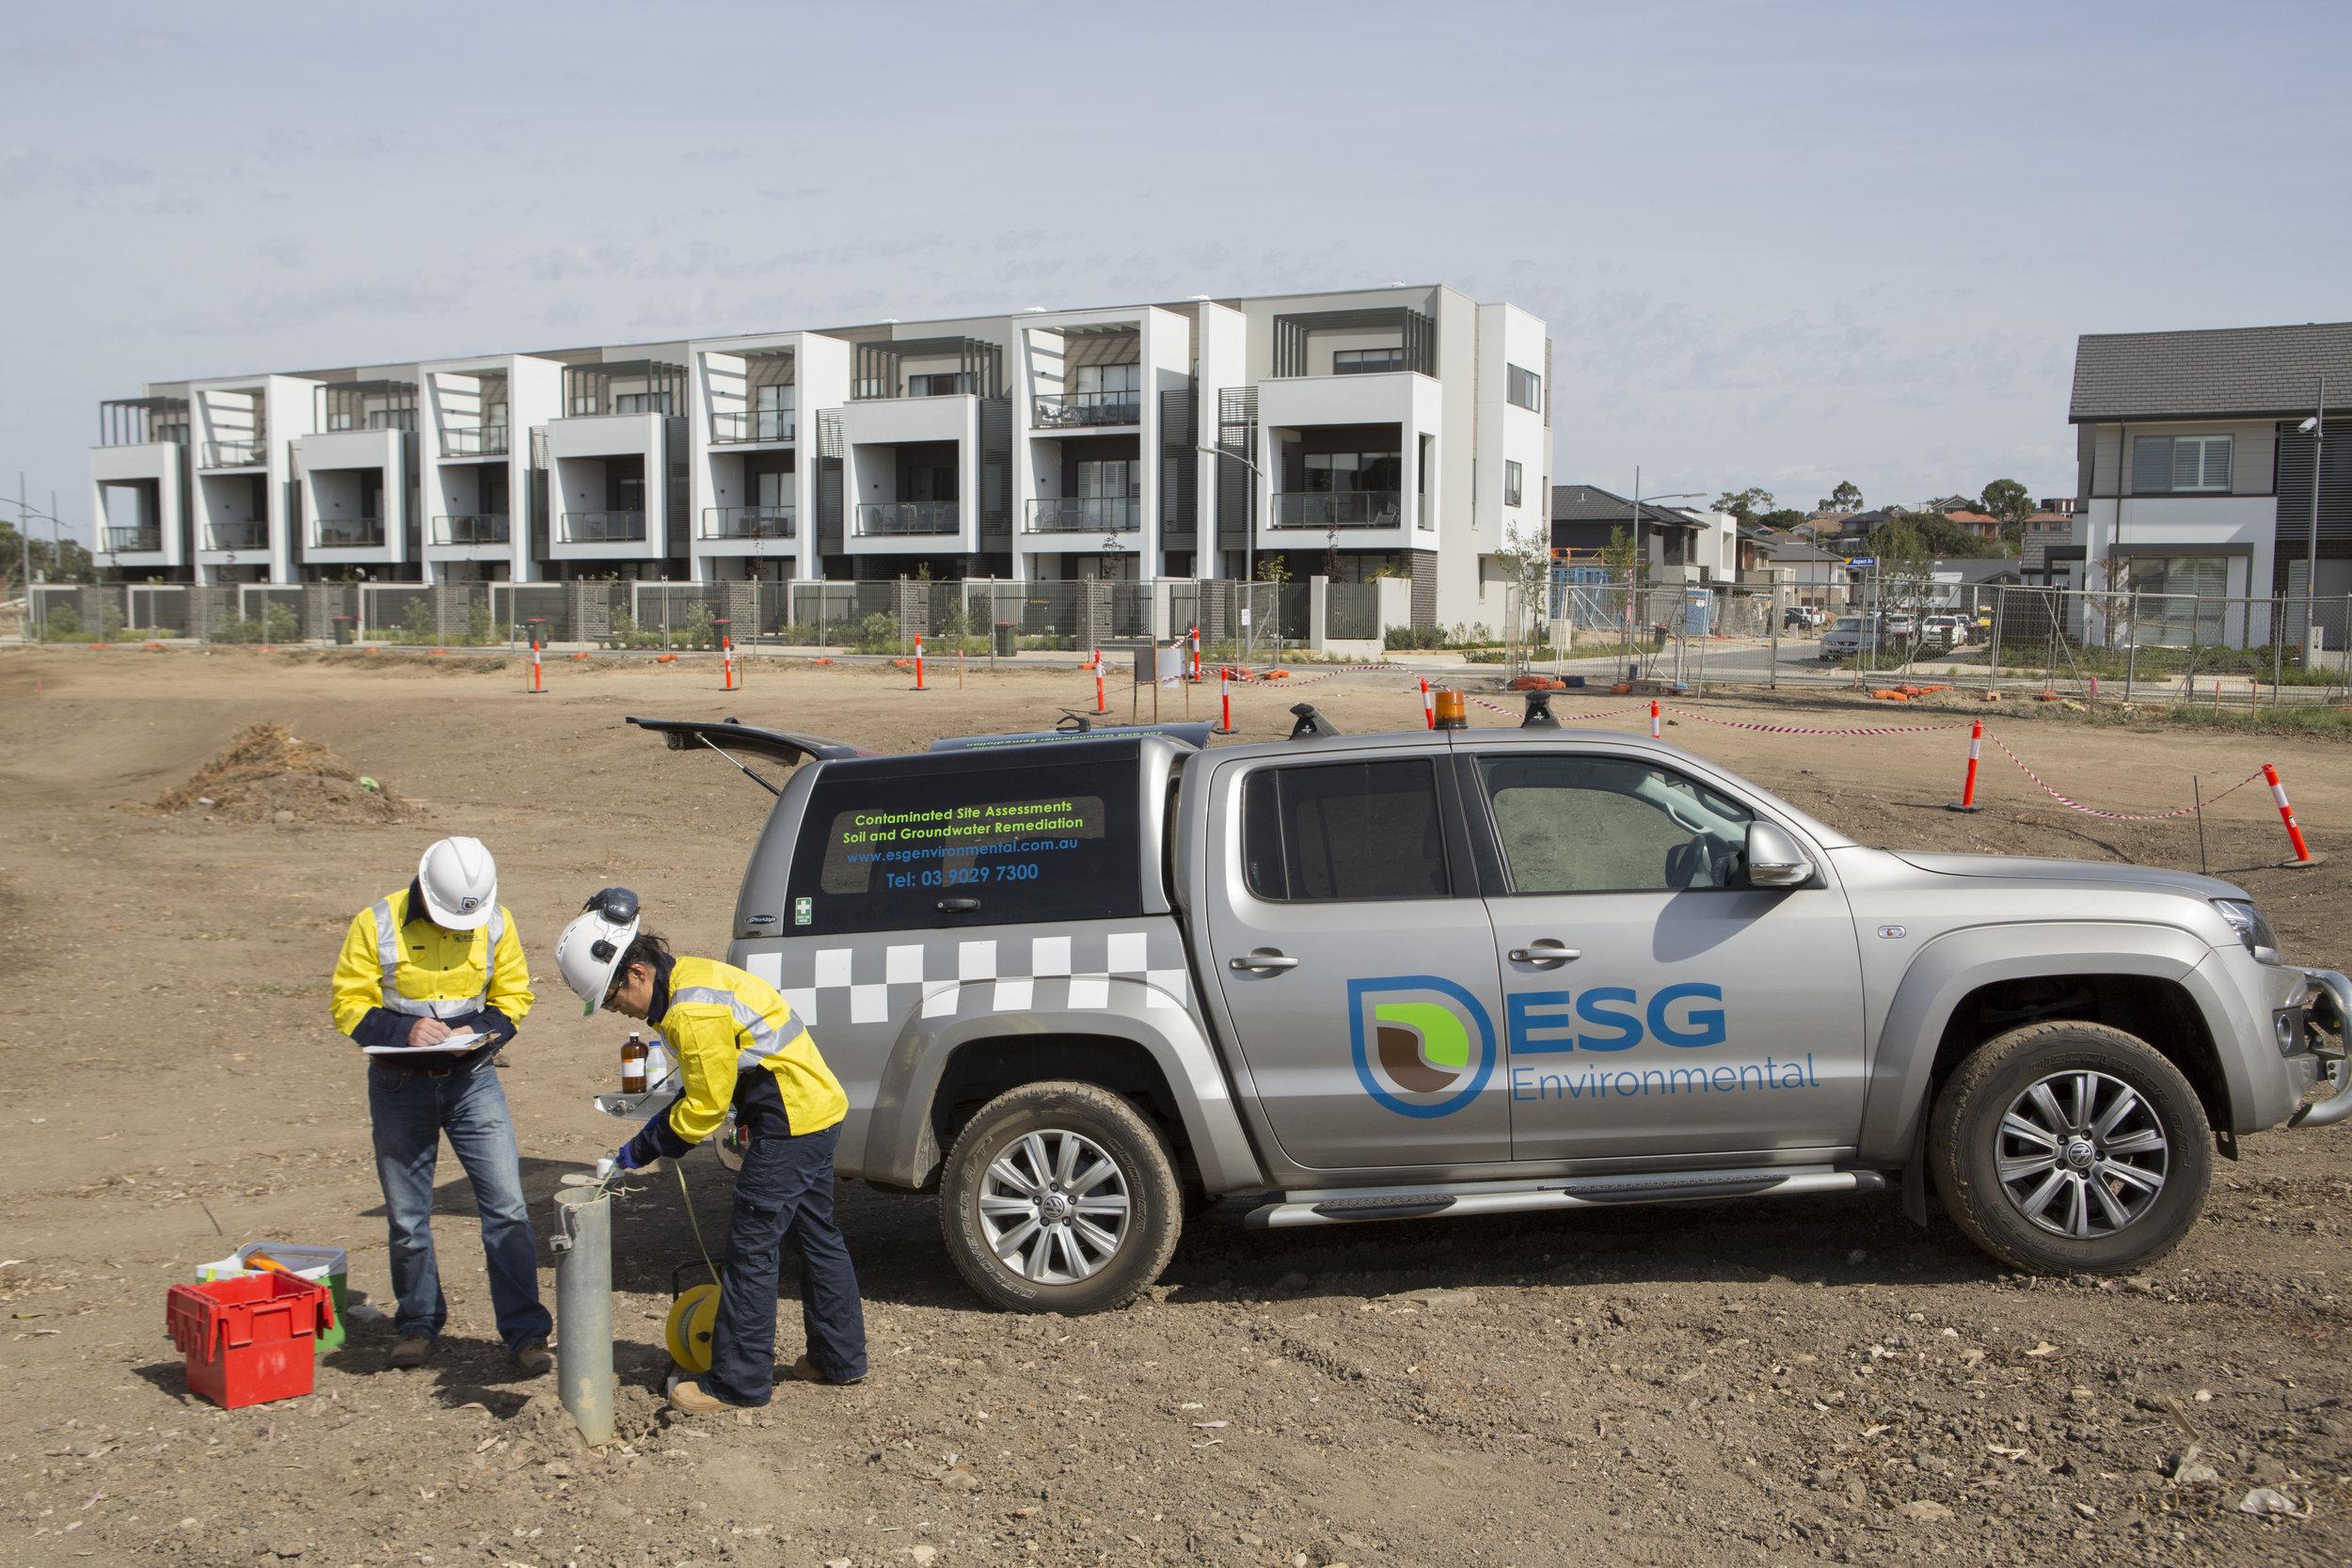 The ESG Environmental team on site at an environmental site investigation.